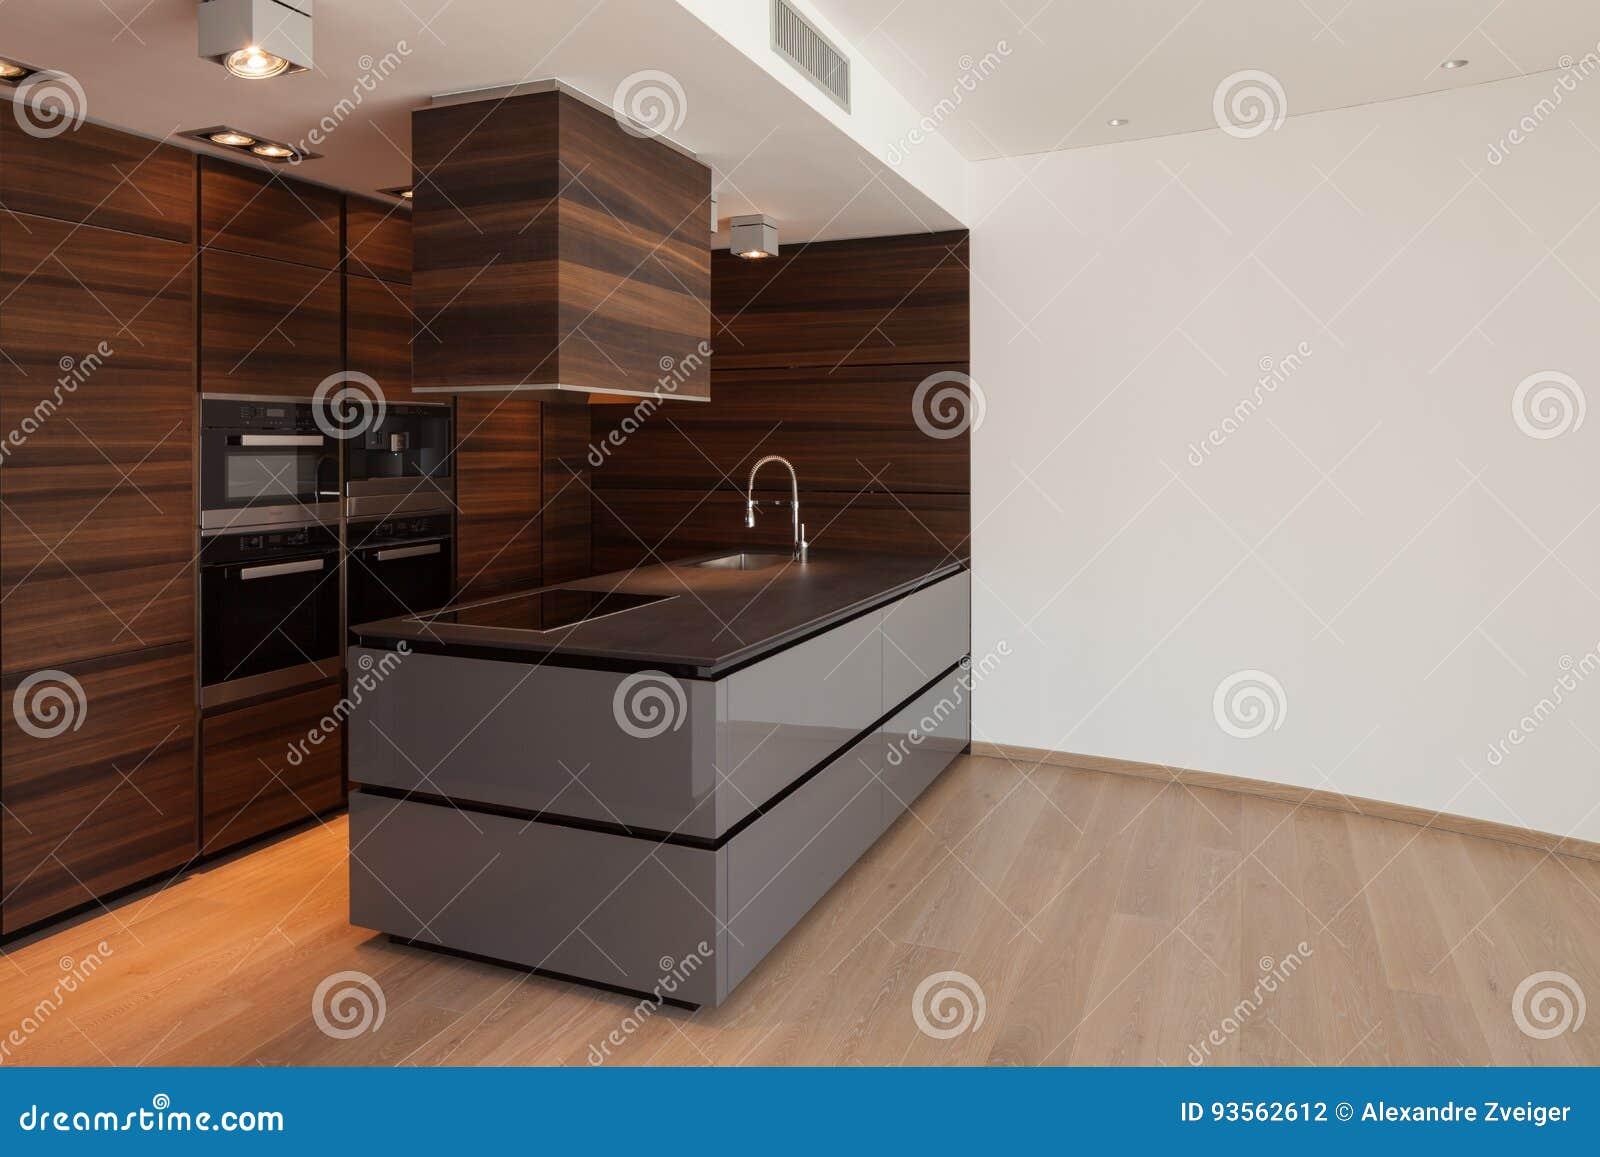 Moderne Kunst Keuken : Brede bruine keuken in moderne flat stock foto afbeelding